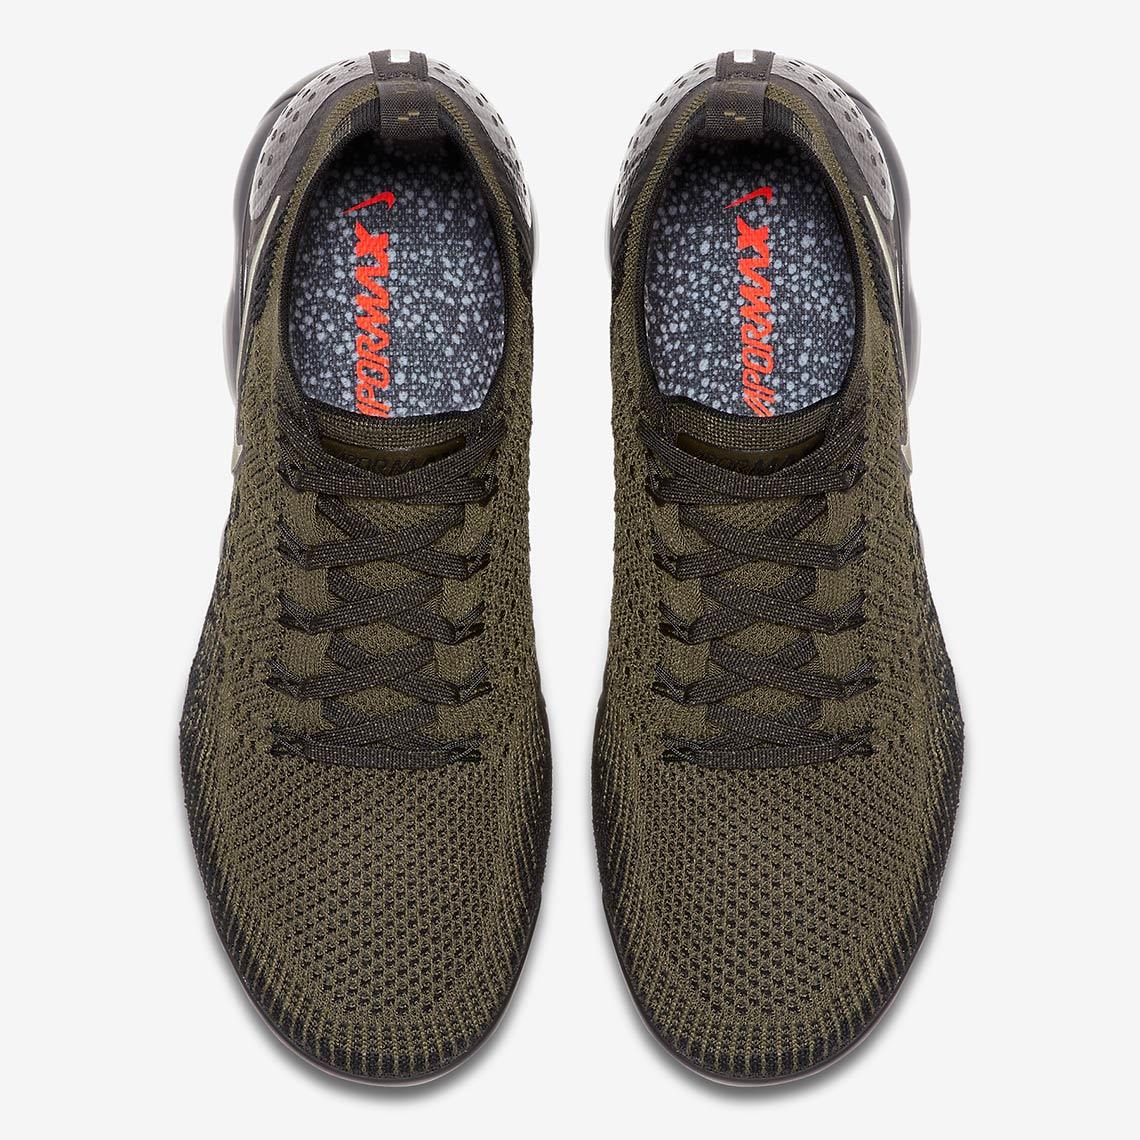 07c0a568a63 Nike Vapormax 2 Crocodile AV7973-300 Info